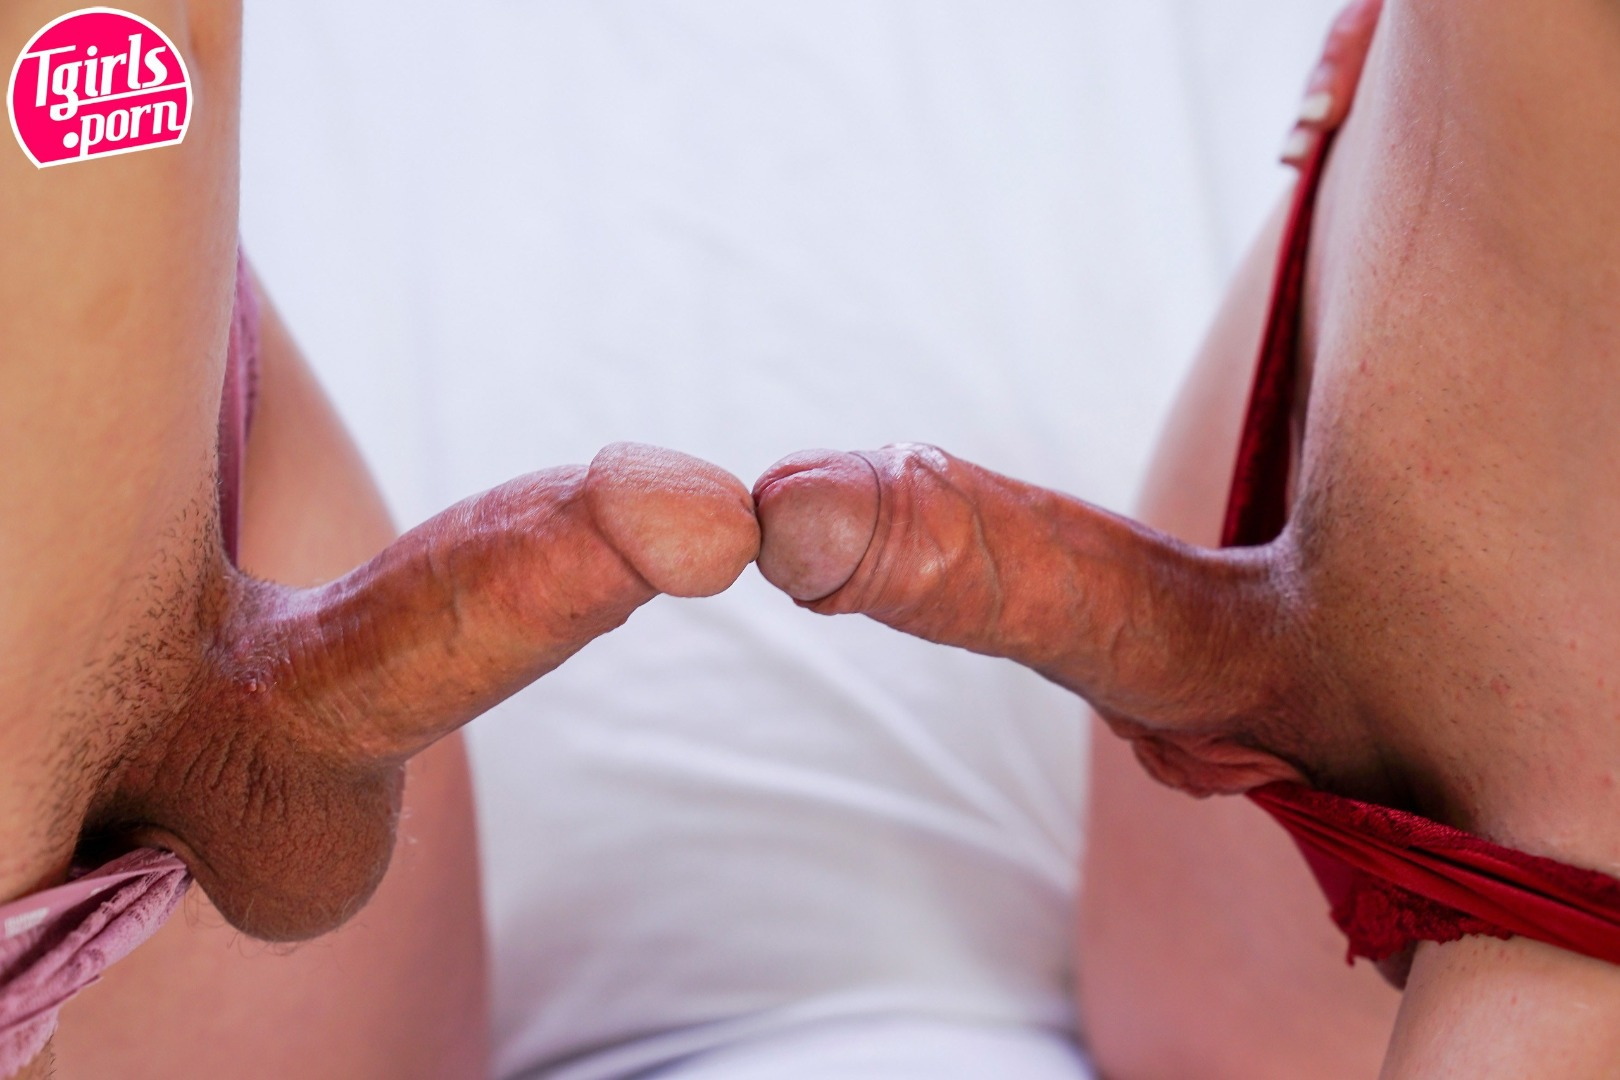 wild hardcore andrew blake group sex #cassidyquinn #lilydemure #shemale #cuteshemale